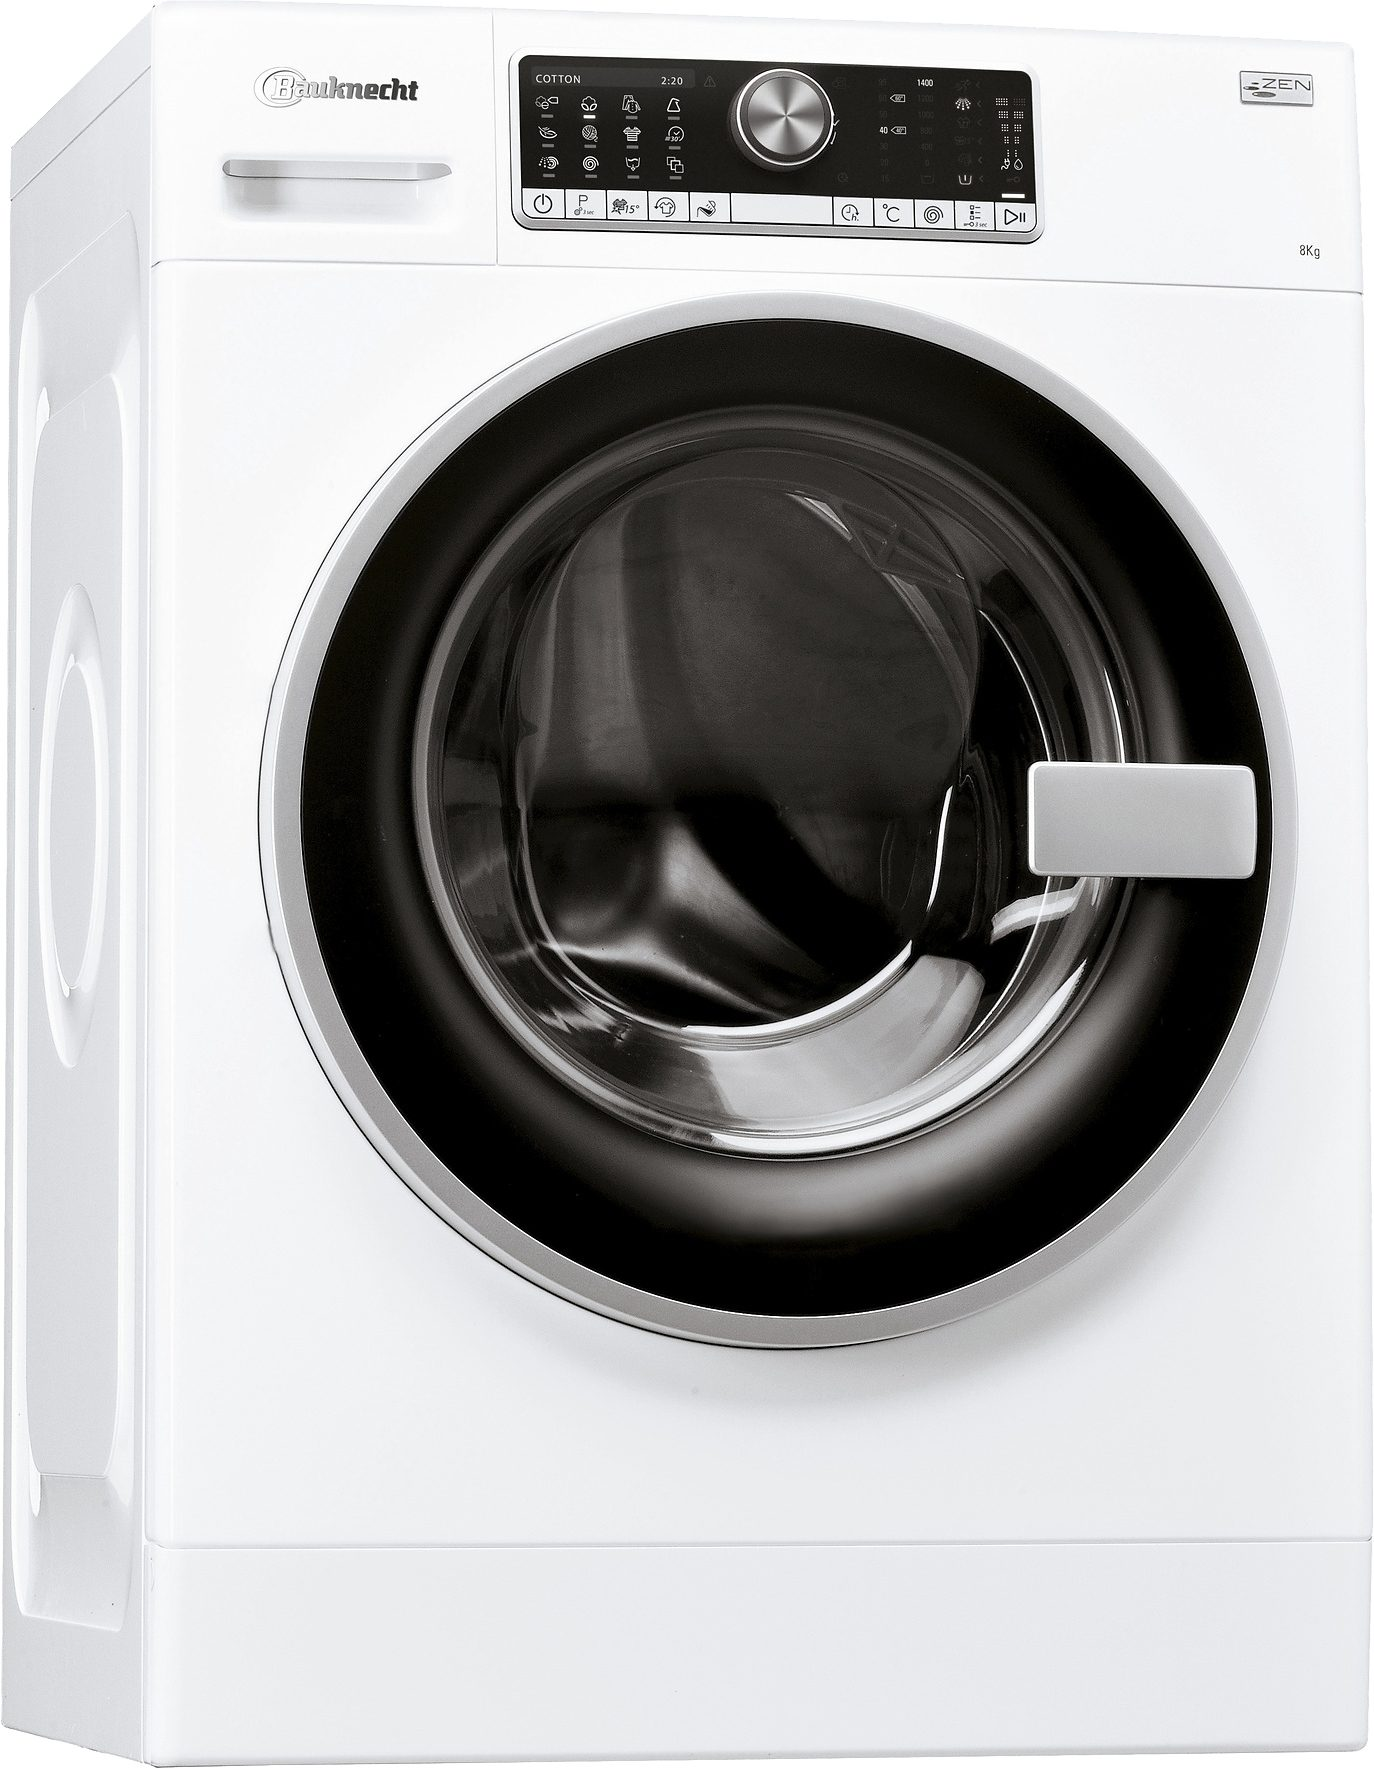 BAUKNECHT Waschmaschine WM Trend 824 ZEN, 8 kg, 1400 U/Min